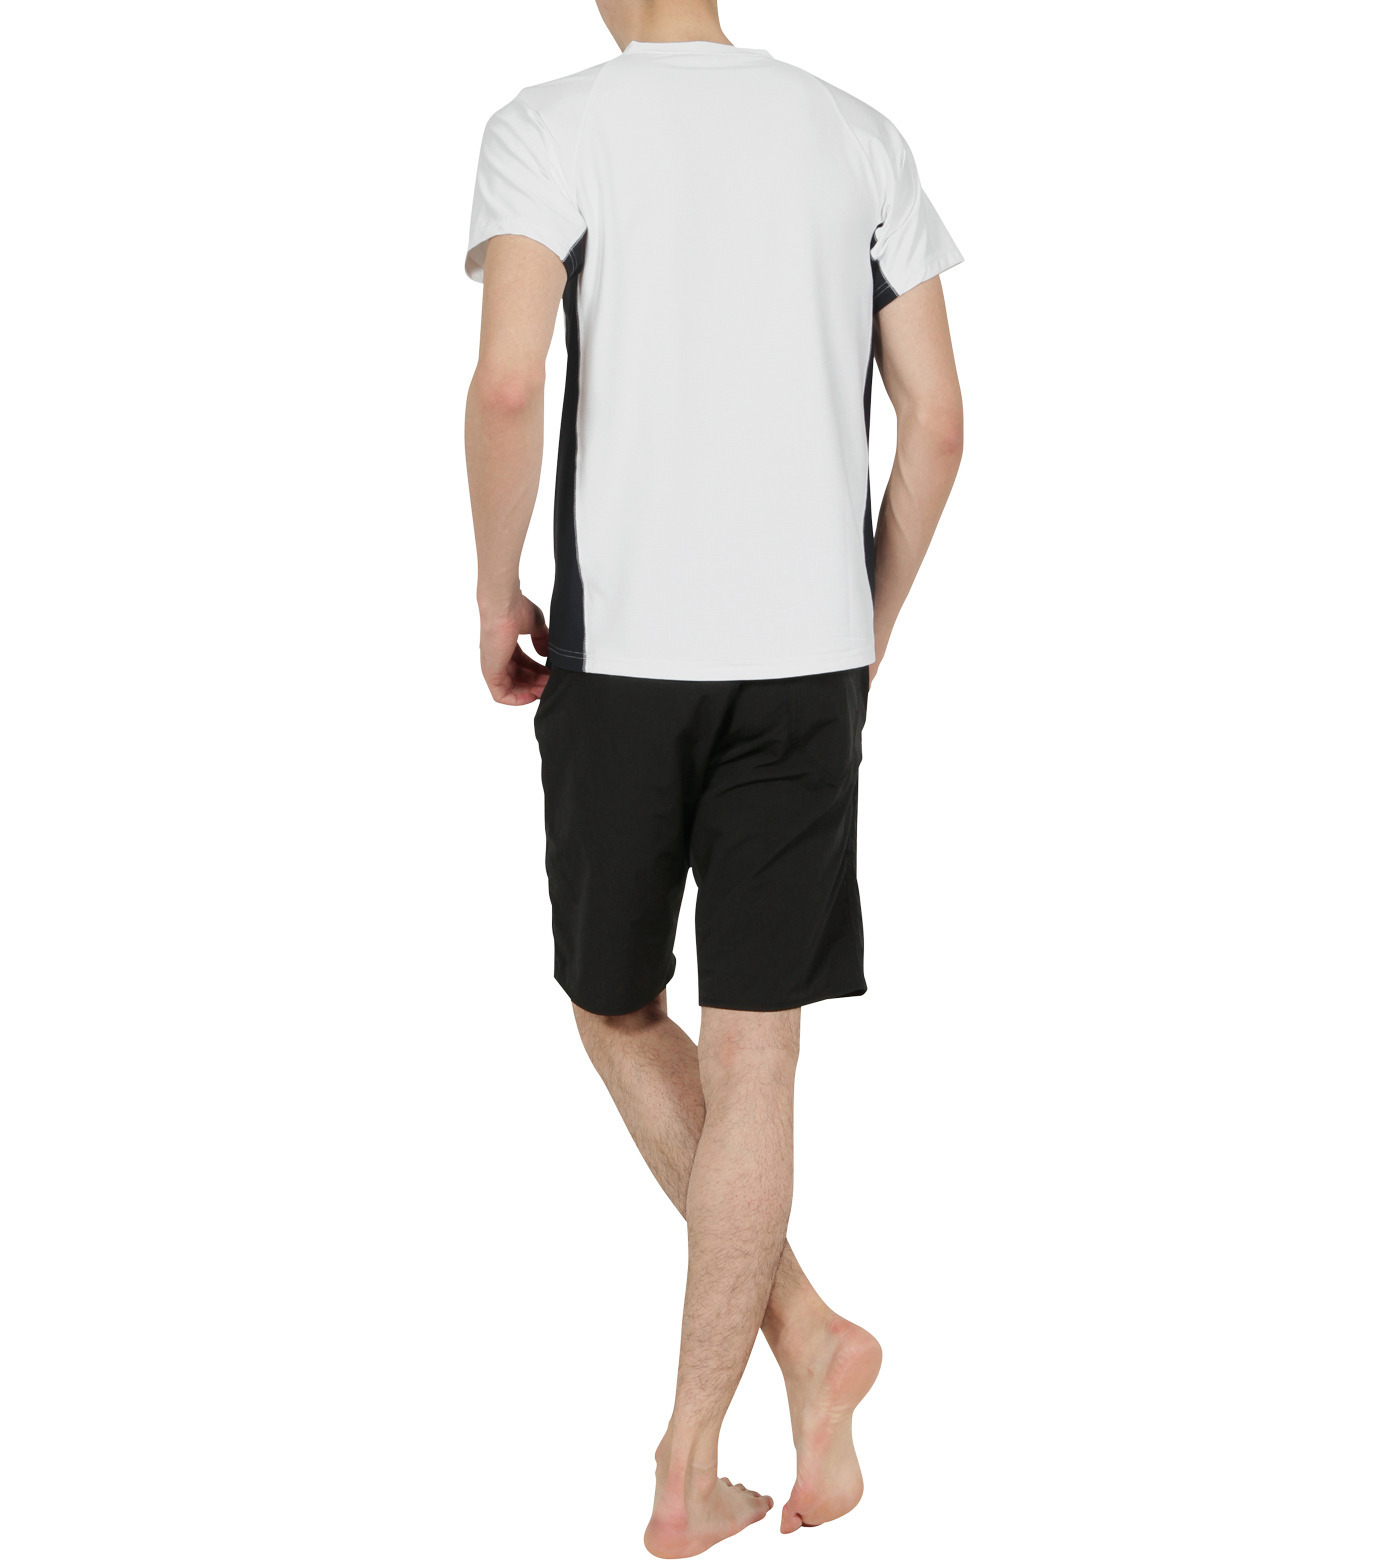 TWO TWO ONE(トゥートゥーワン)のSurf shorts long-BLACK(SWIMWEAR/SWIMWEAR)-15N948002-13 拡大詳細画像4